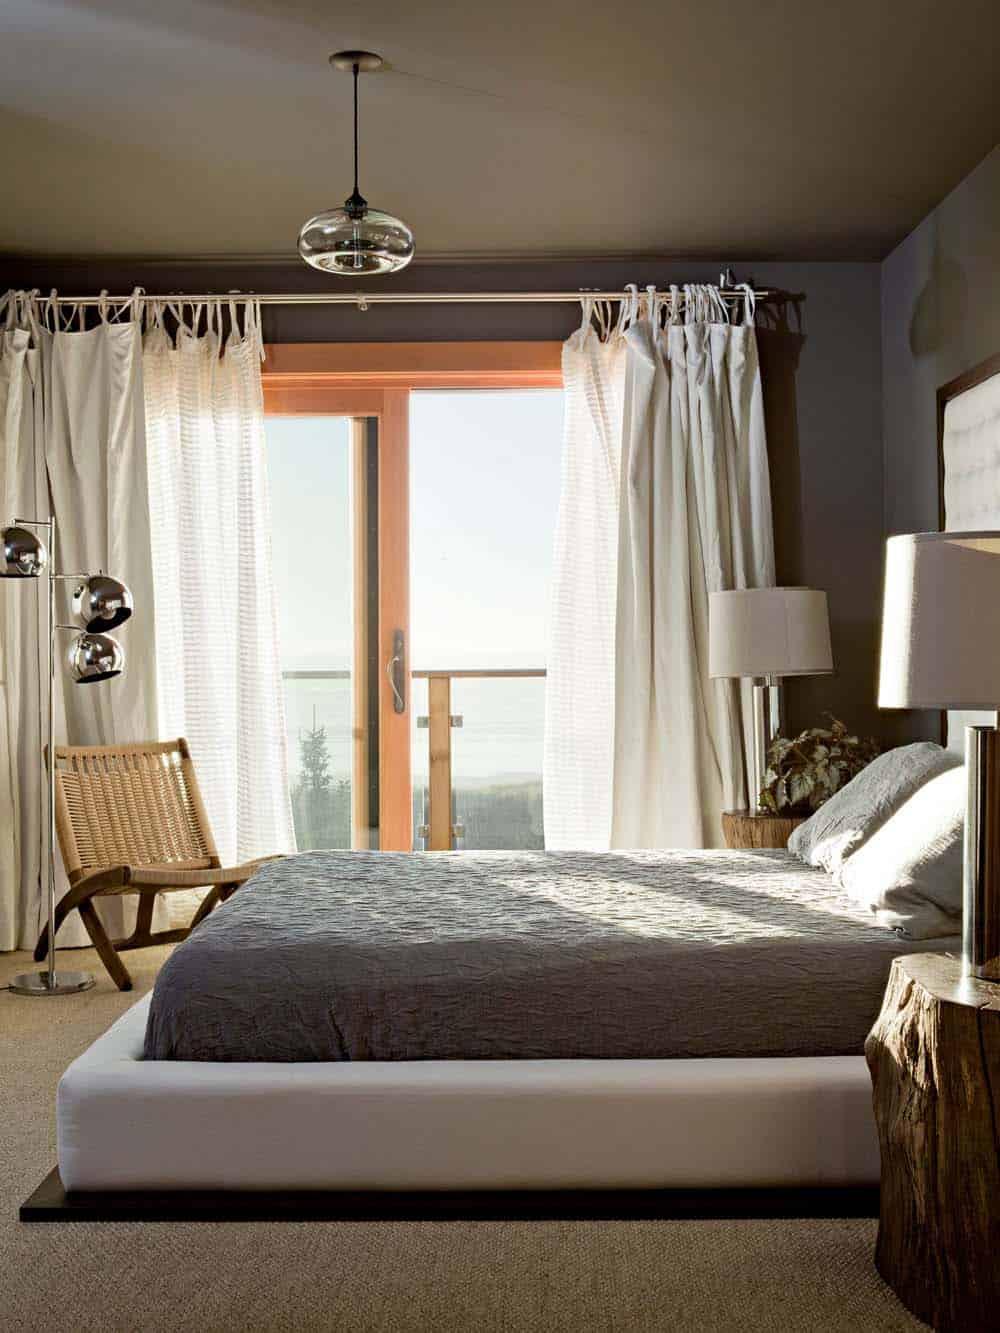 Coastal Home Design-Jessica Helgerson Interior Design-13-1 Kindesign